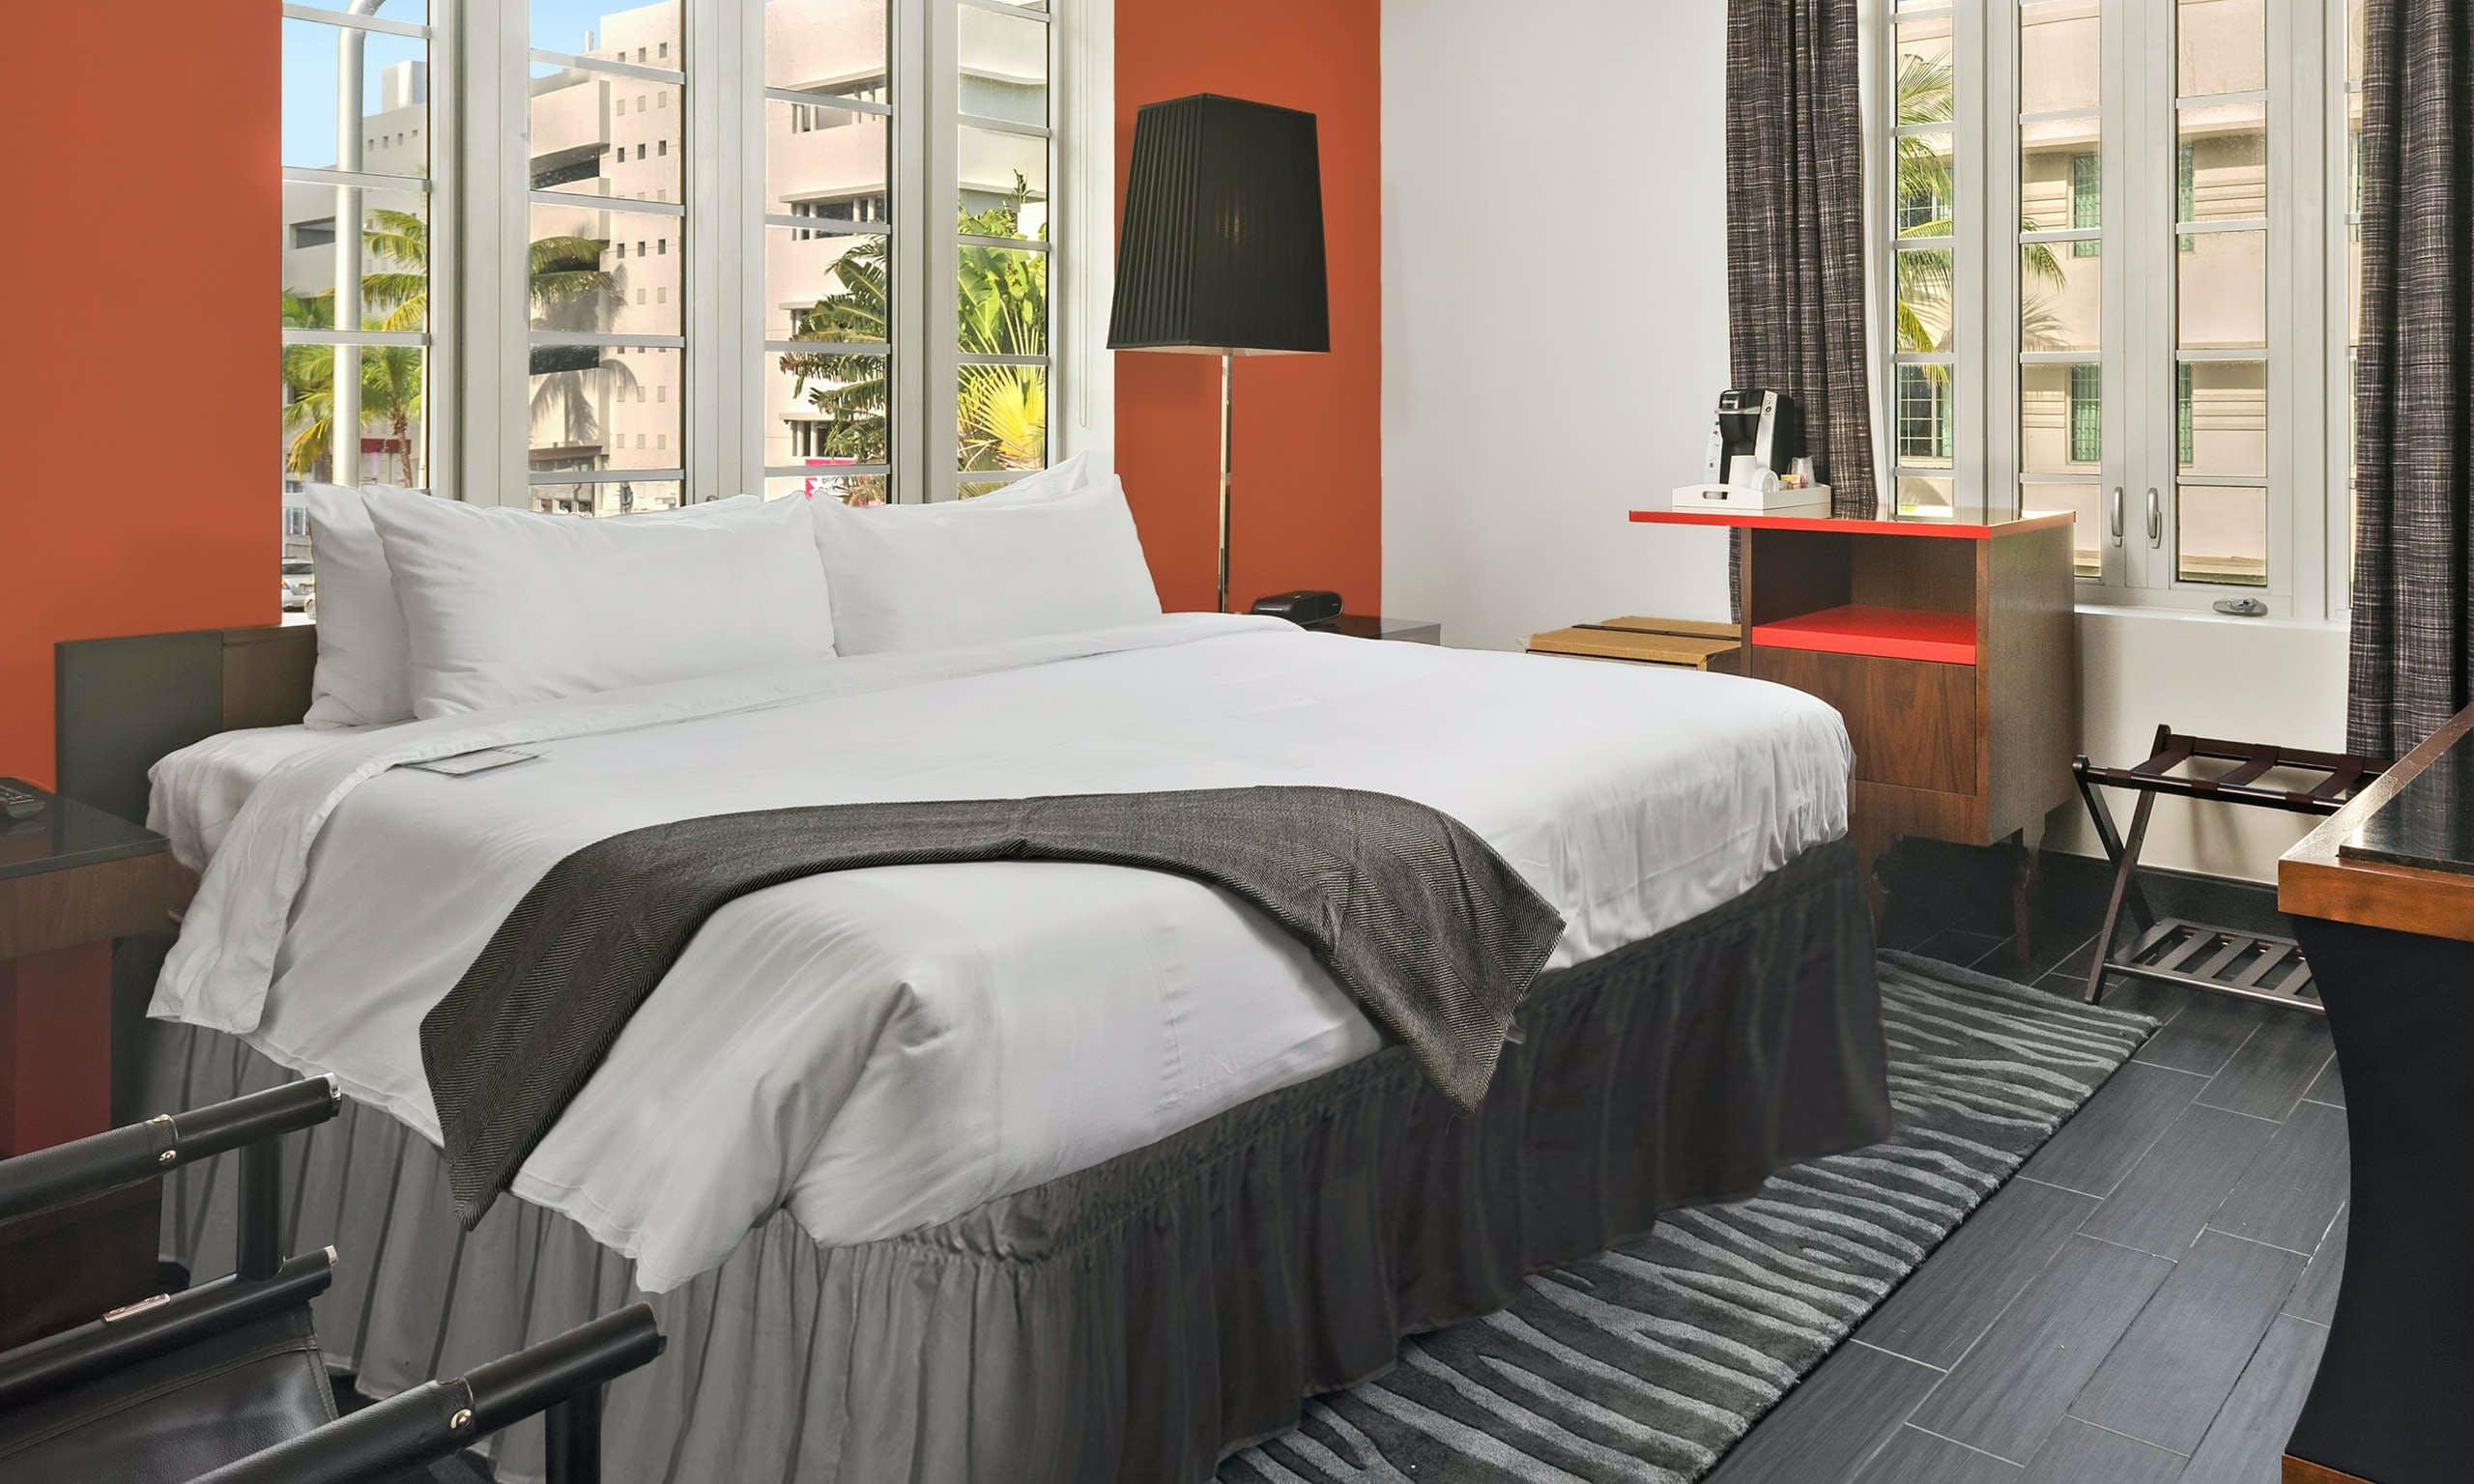 Fairwind Hotel